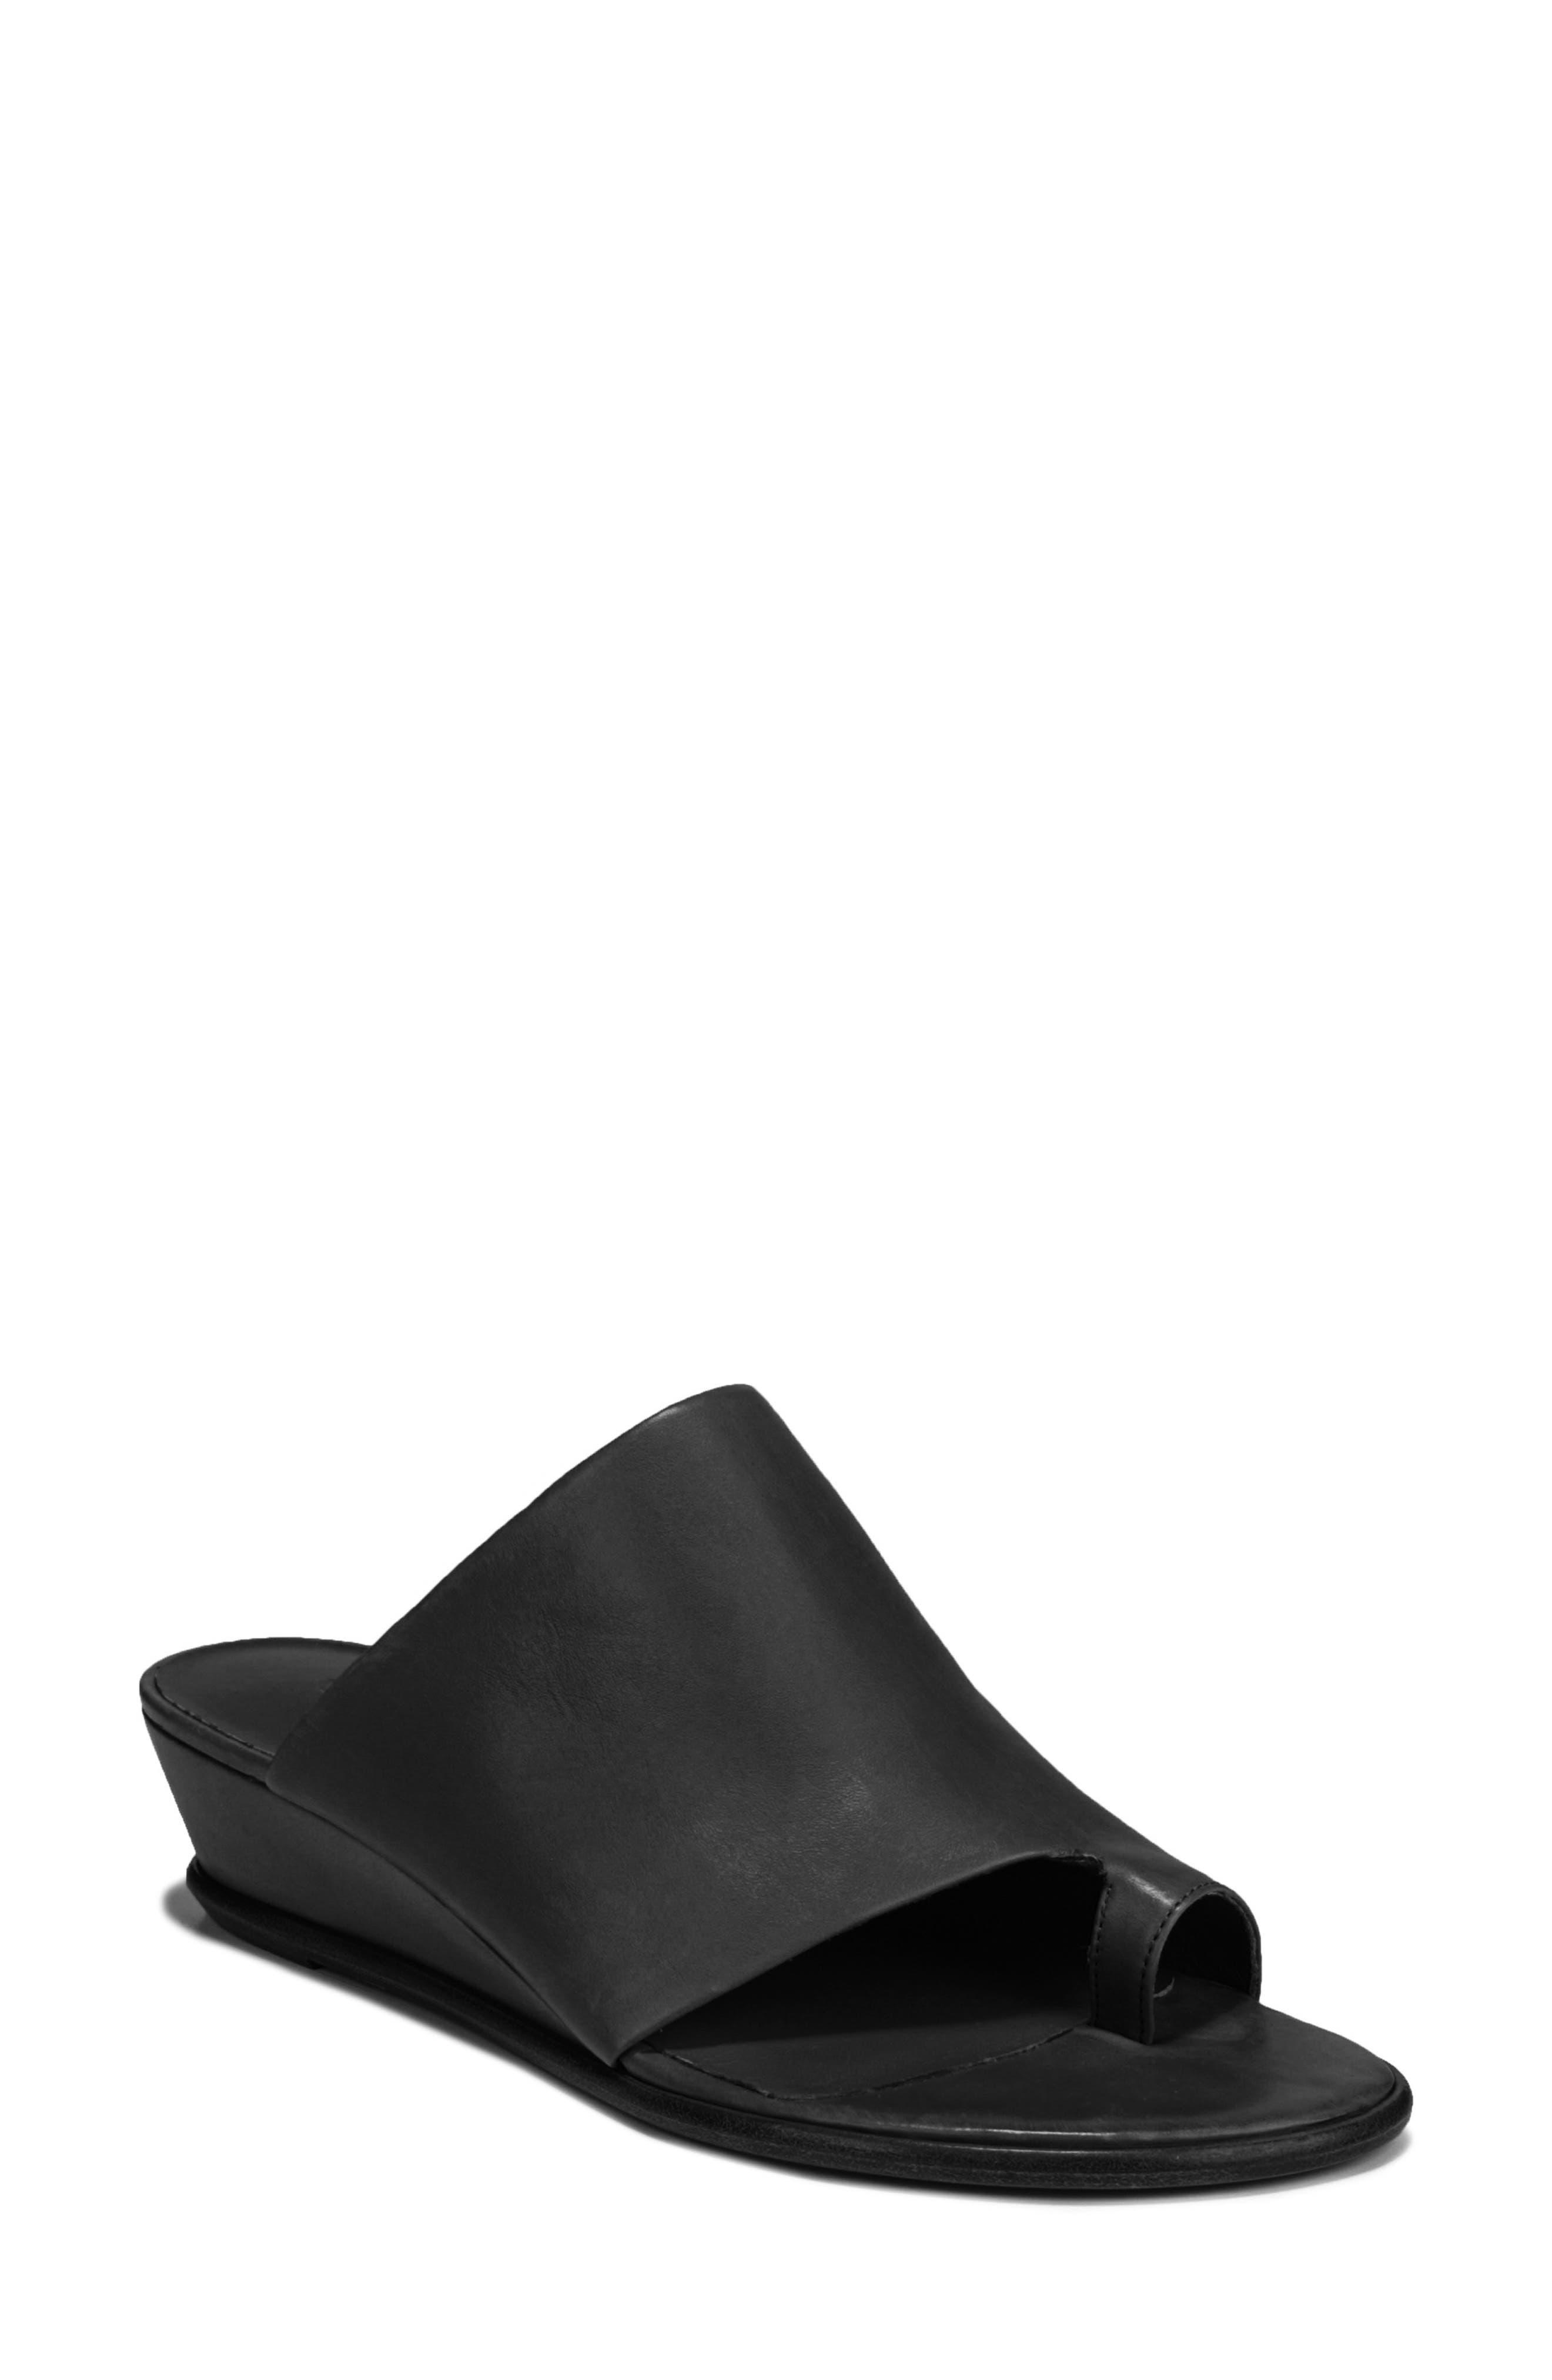 VINCE, Darla Slide Sandal, Main thumbnail 1, color, BLACK